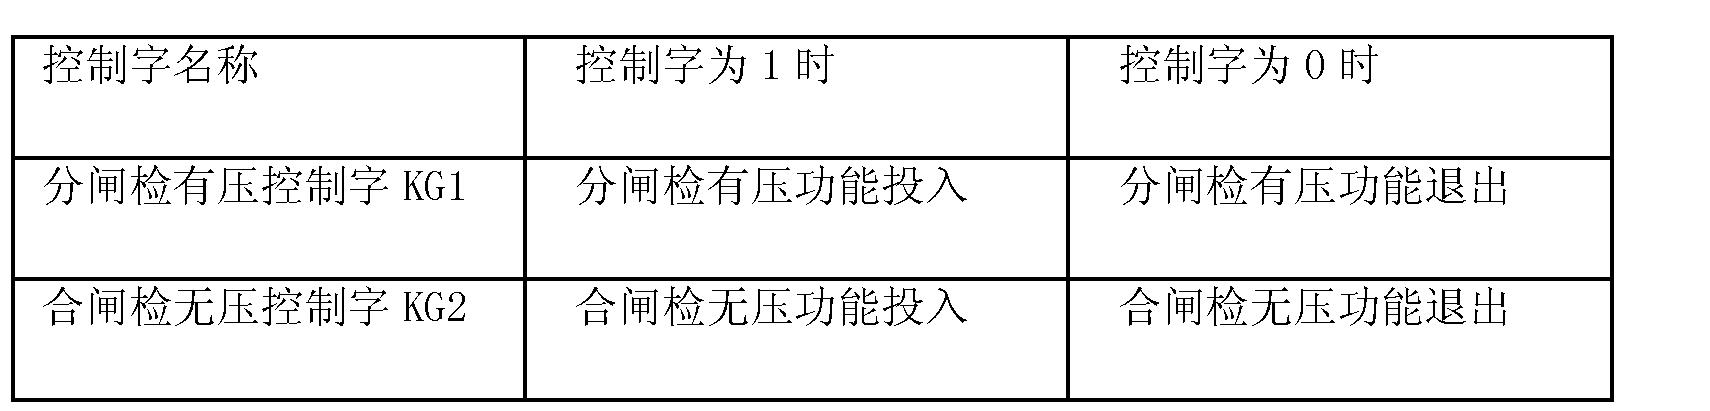 Figure CN102403783AD00201